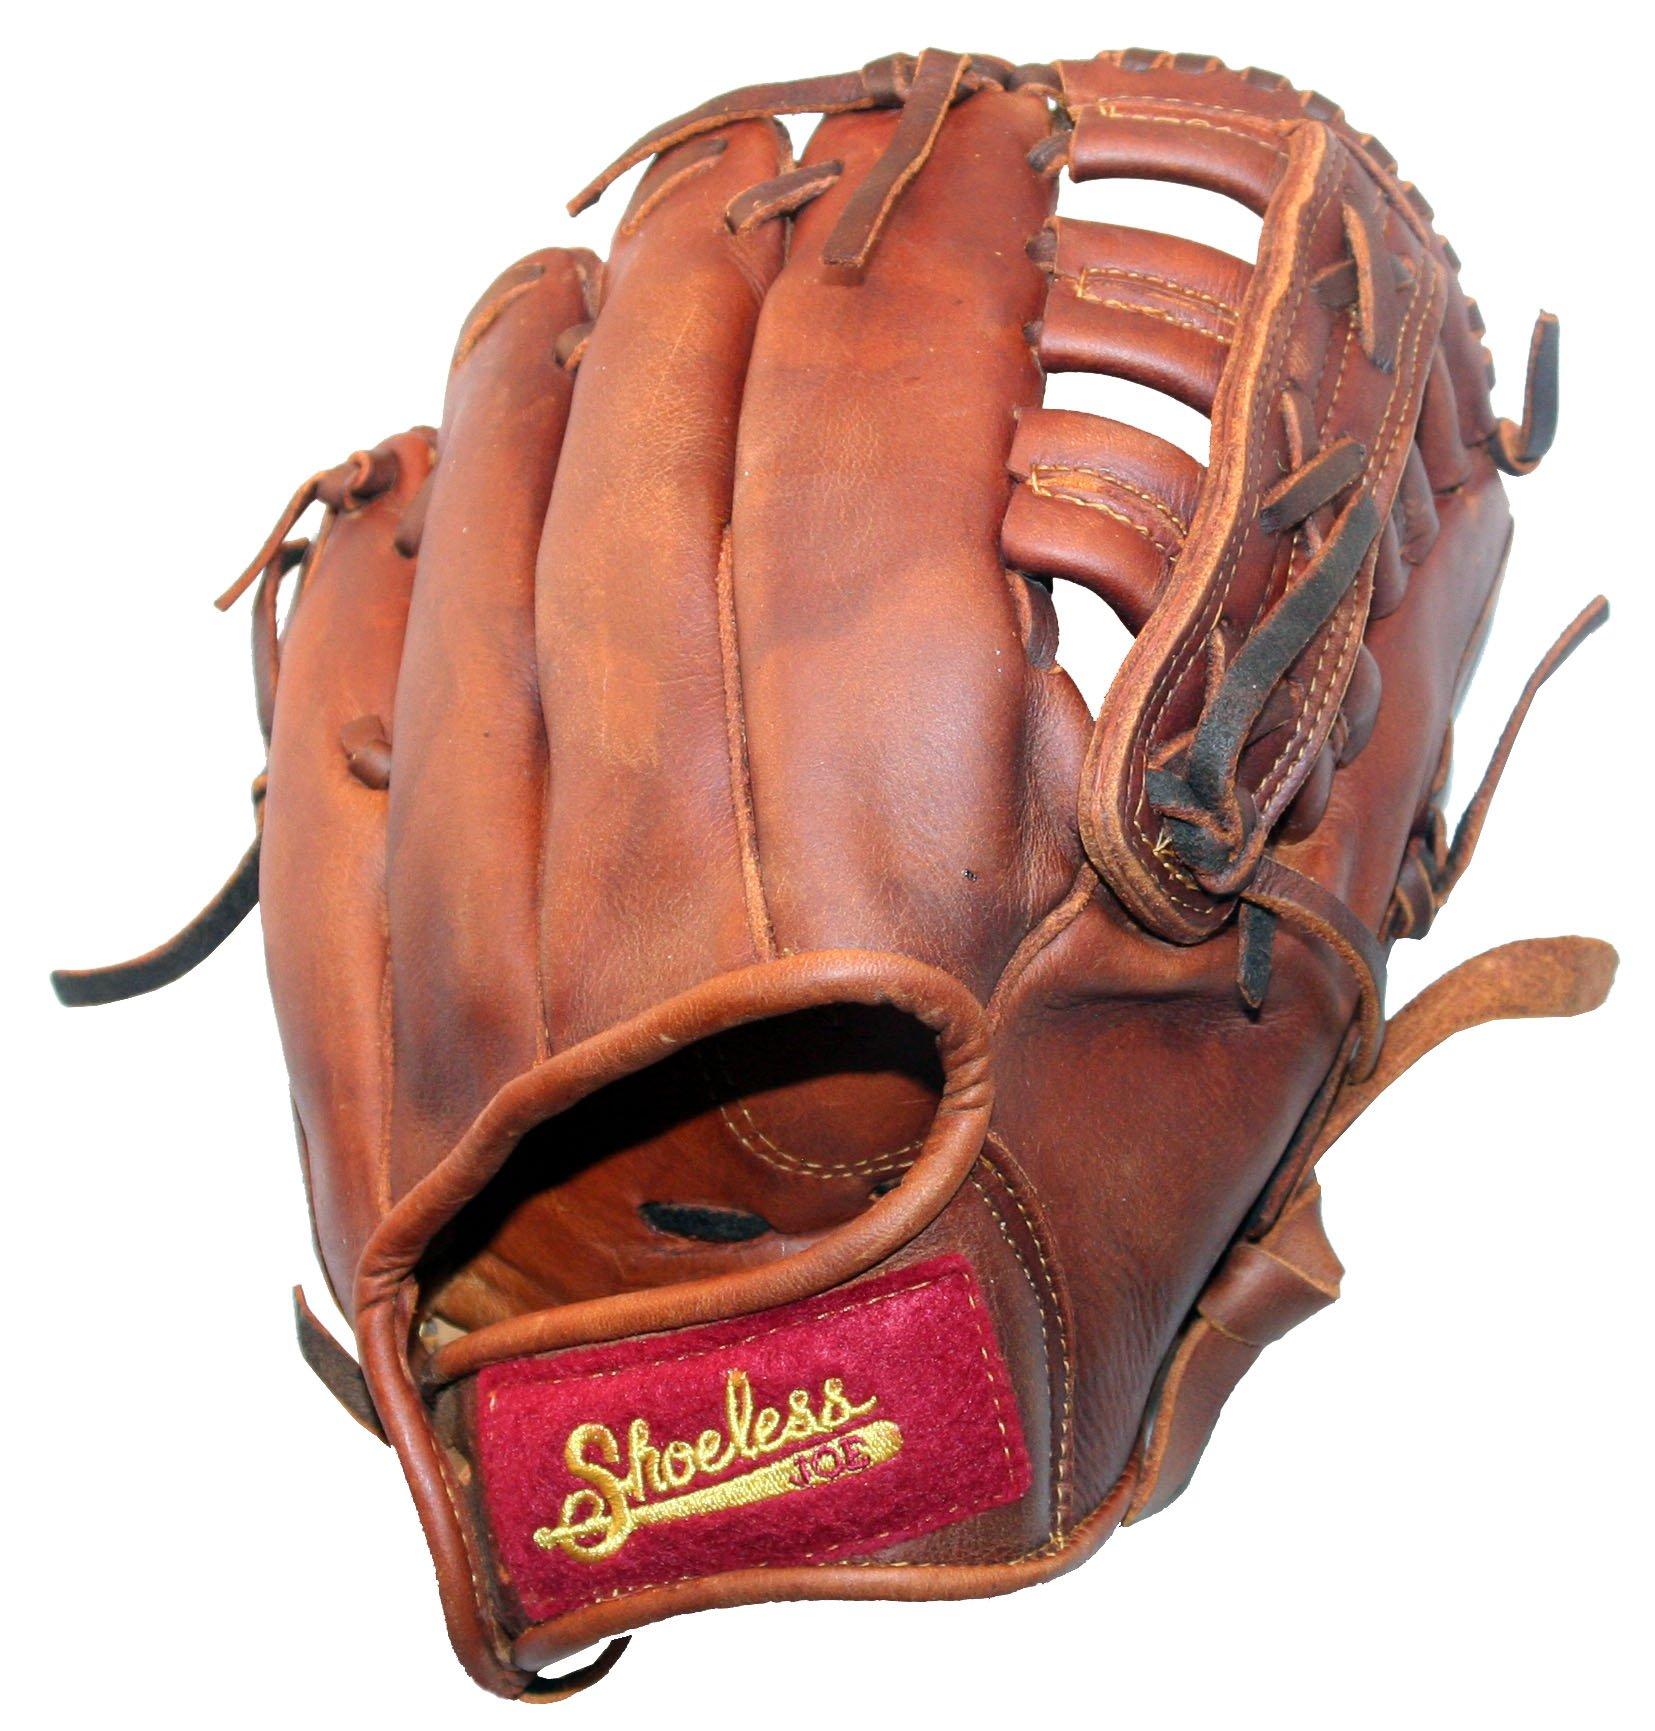 Shoeless Joe Child's First Baseball Glove, 100% Leather Classic Ball Glove (10'', Right-Hand Throw)